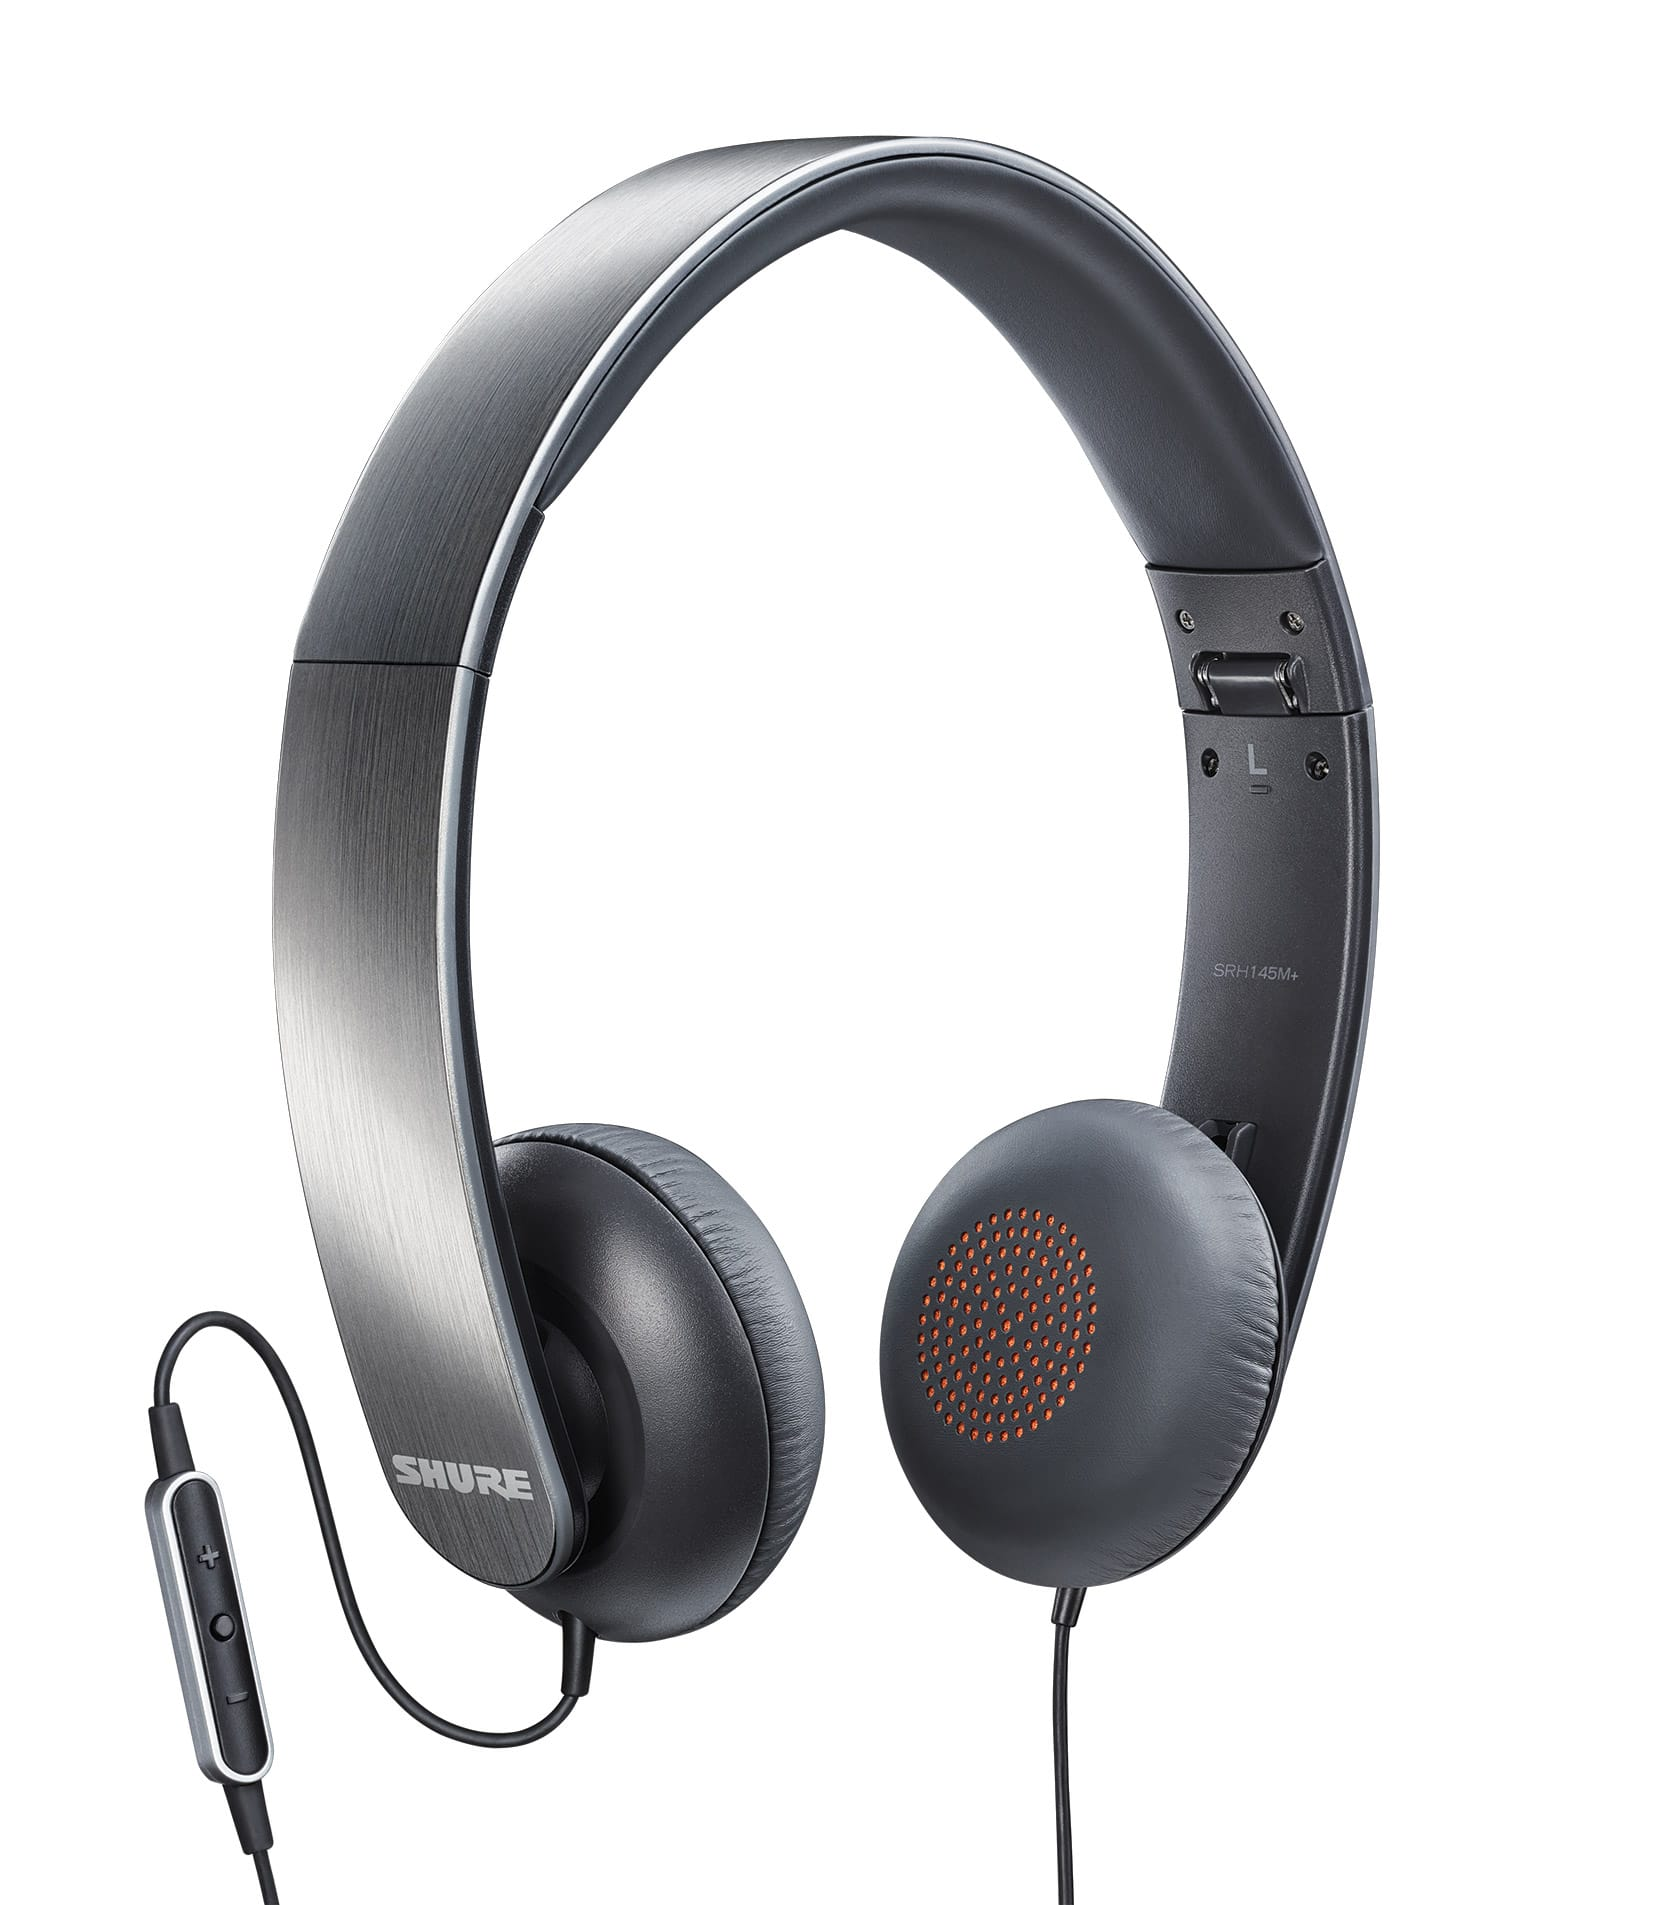 Buy Shure - SRH145M Portable Headphones w 3 button control